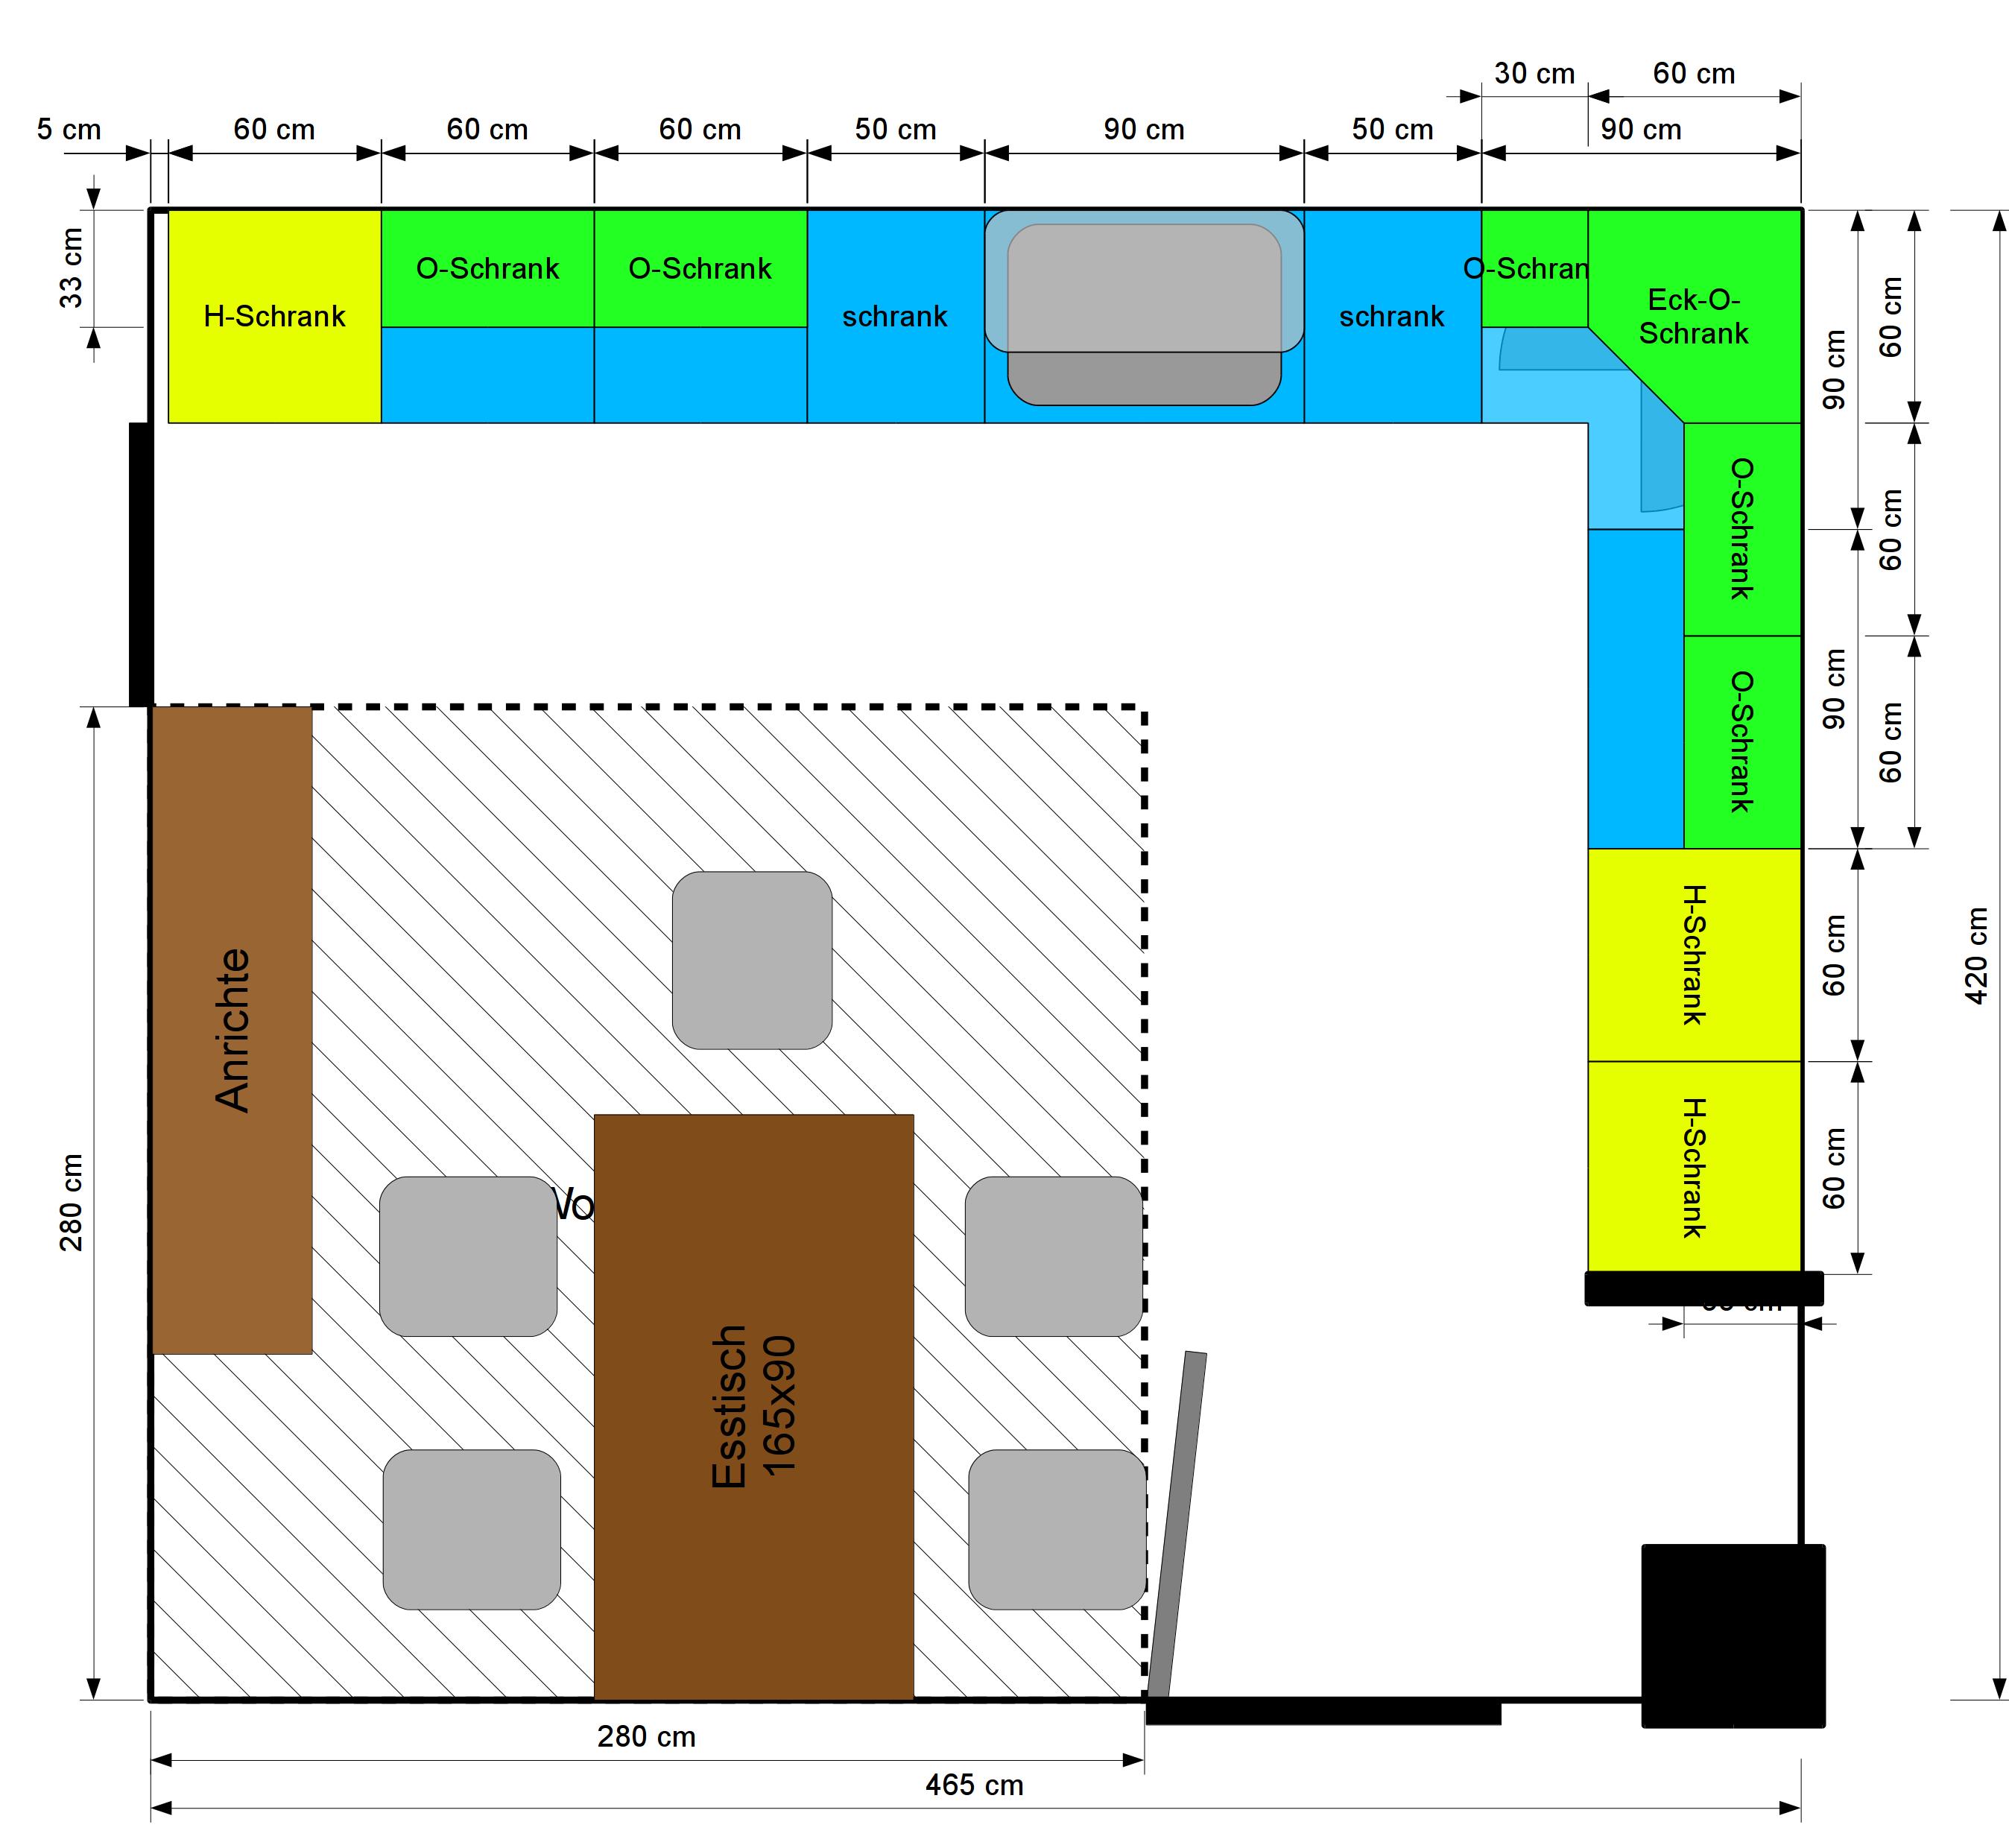 aktuelle planung f r die einbauk che hof isem. Black Bedroom Furniture Sets. Home Design Ideas